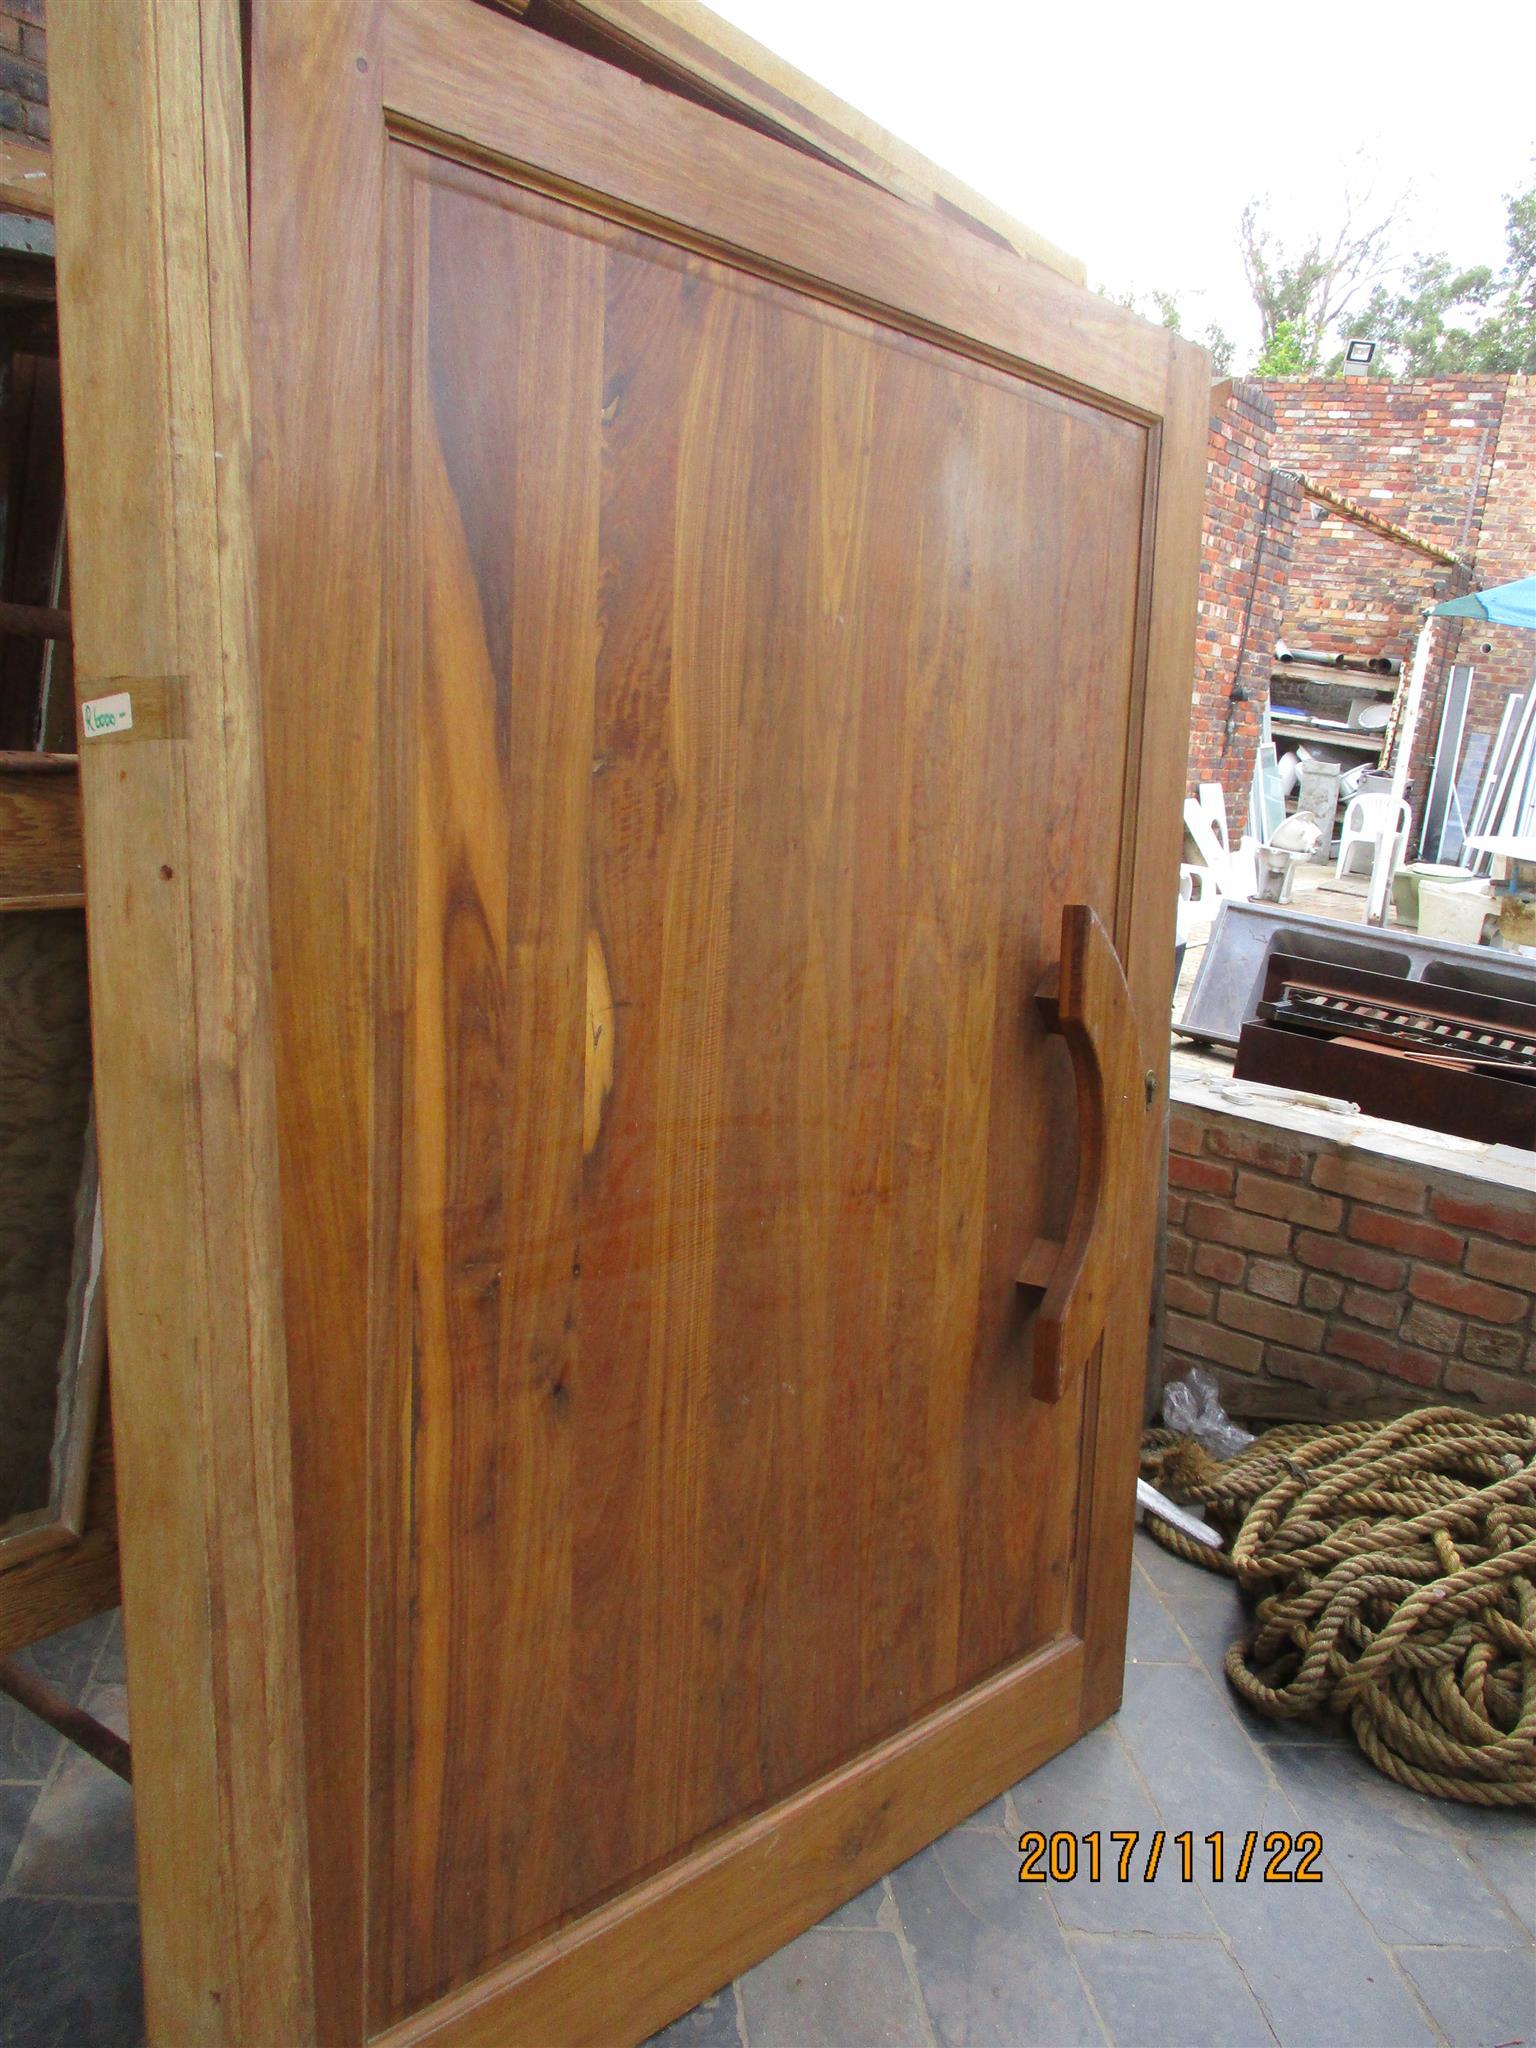 2nd hand Kiaat pivot door and frame for sale